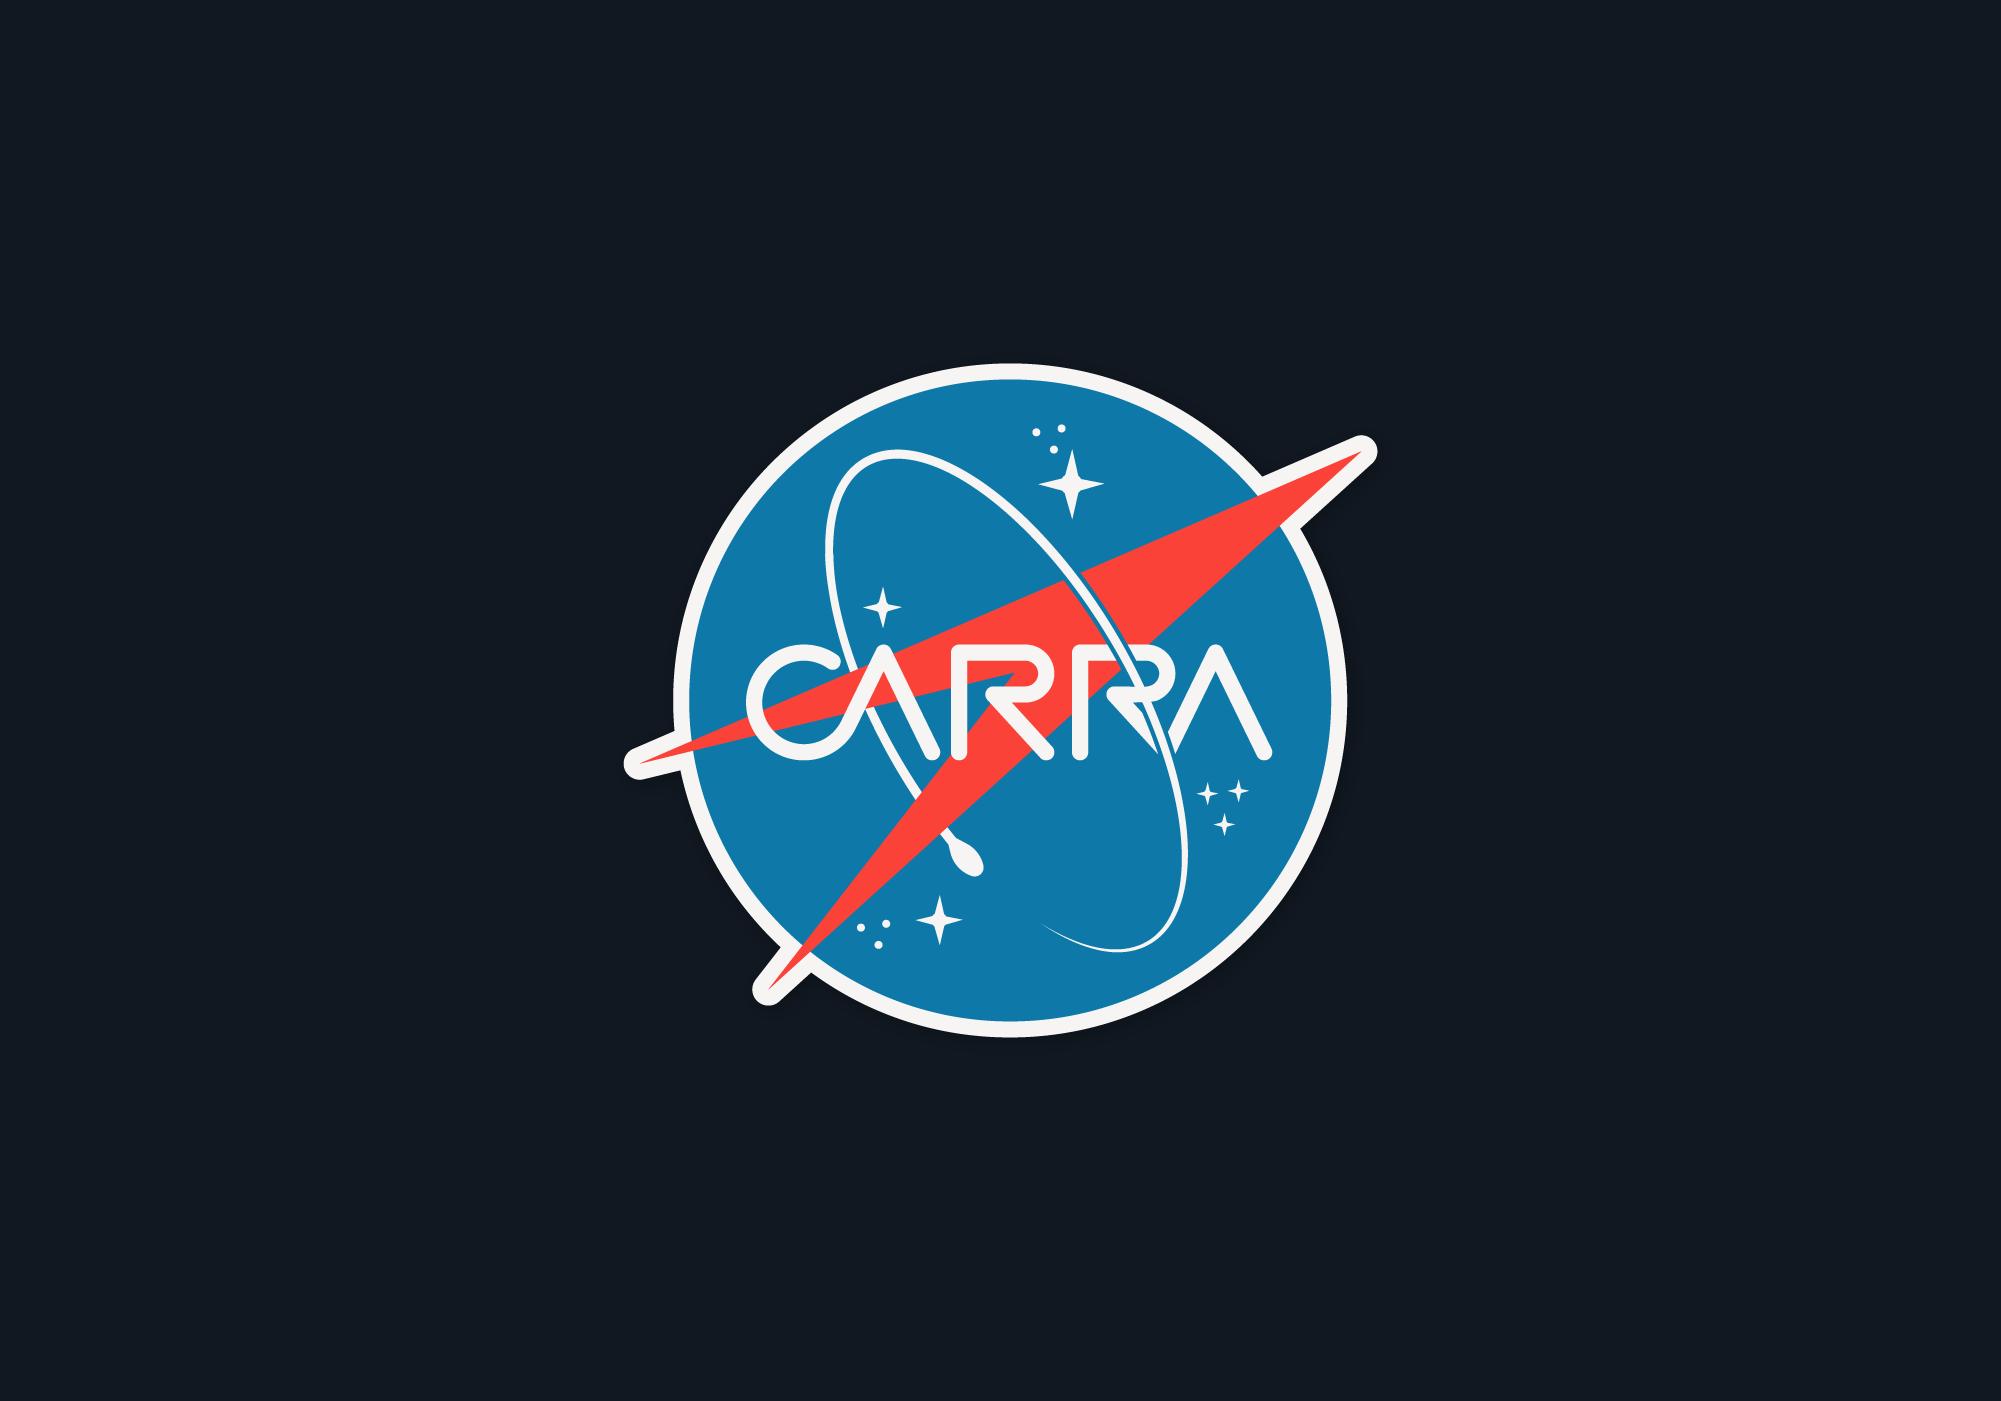 Carra NASA.png